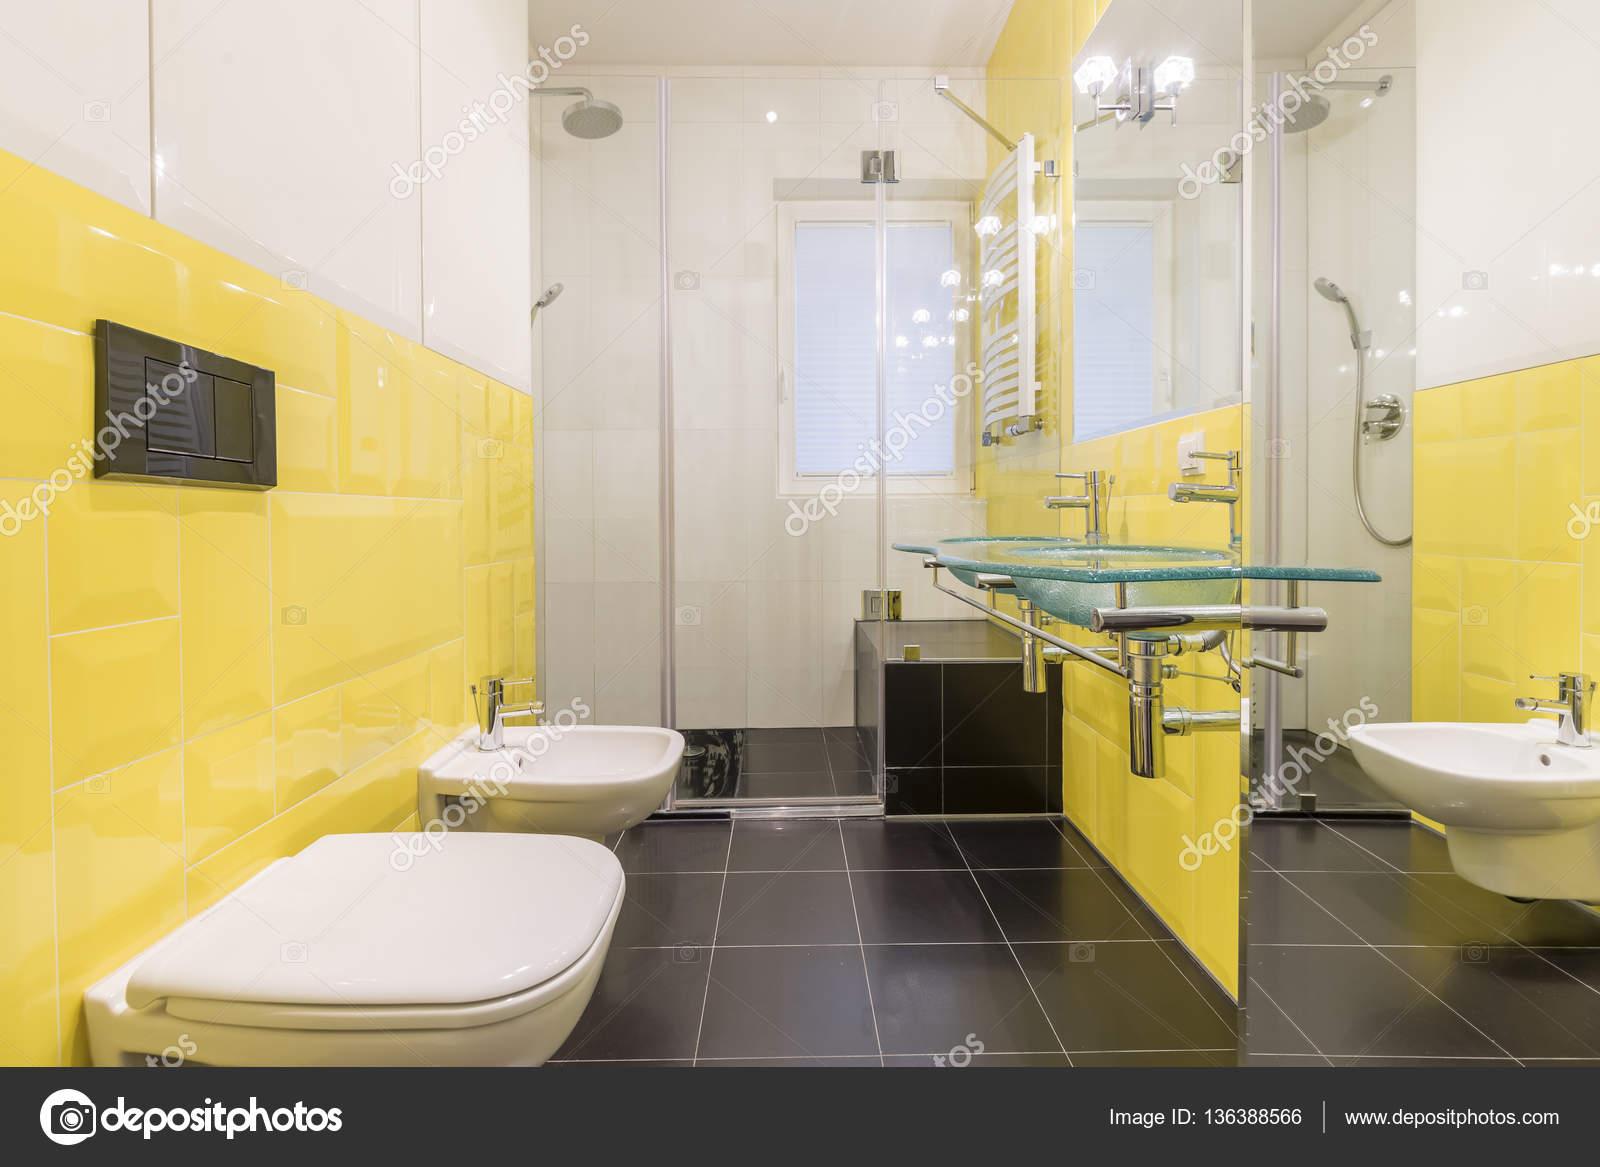 Bagno con piastrelle gialle foto stock 136388566 - Stock piastrelle bagno ...